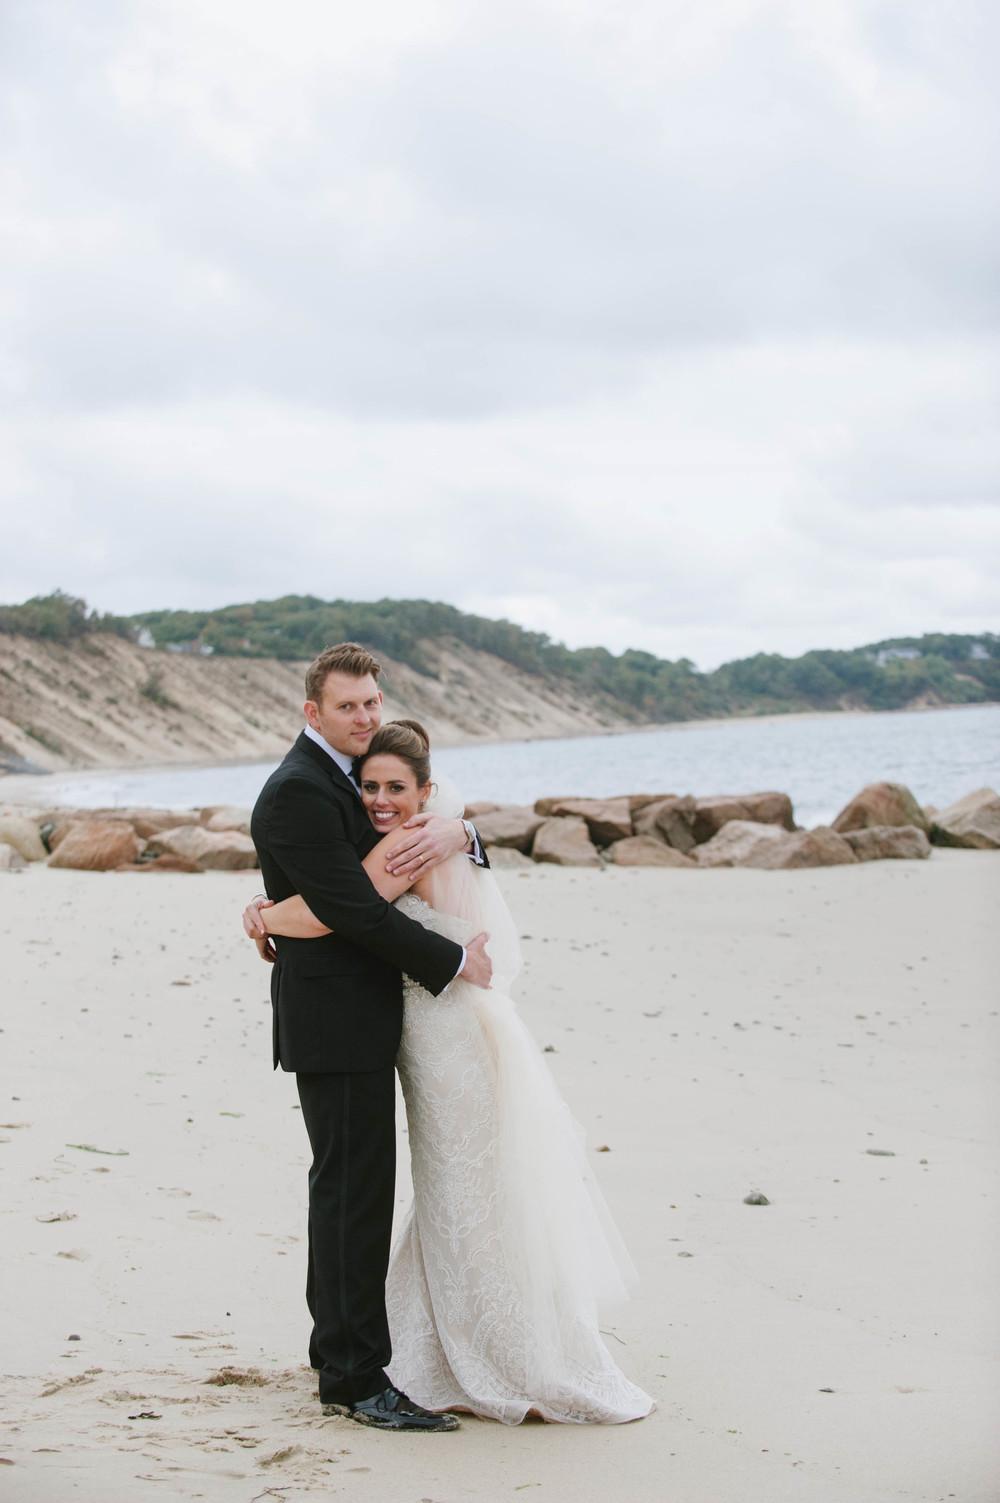 White_Cliffs_Plymouth_Wedding-39.jpg